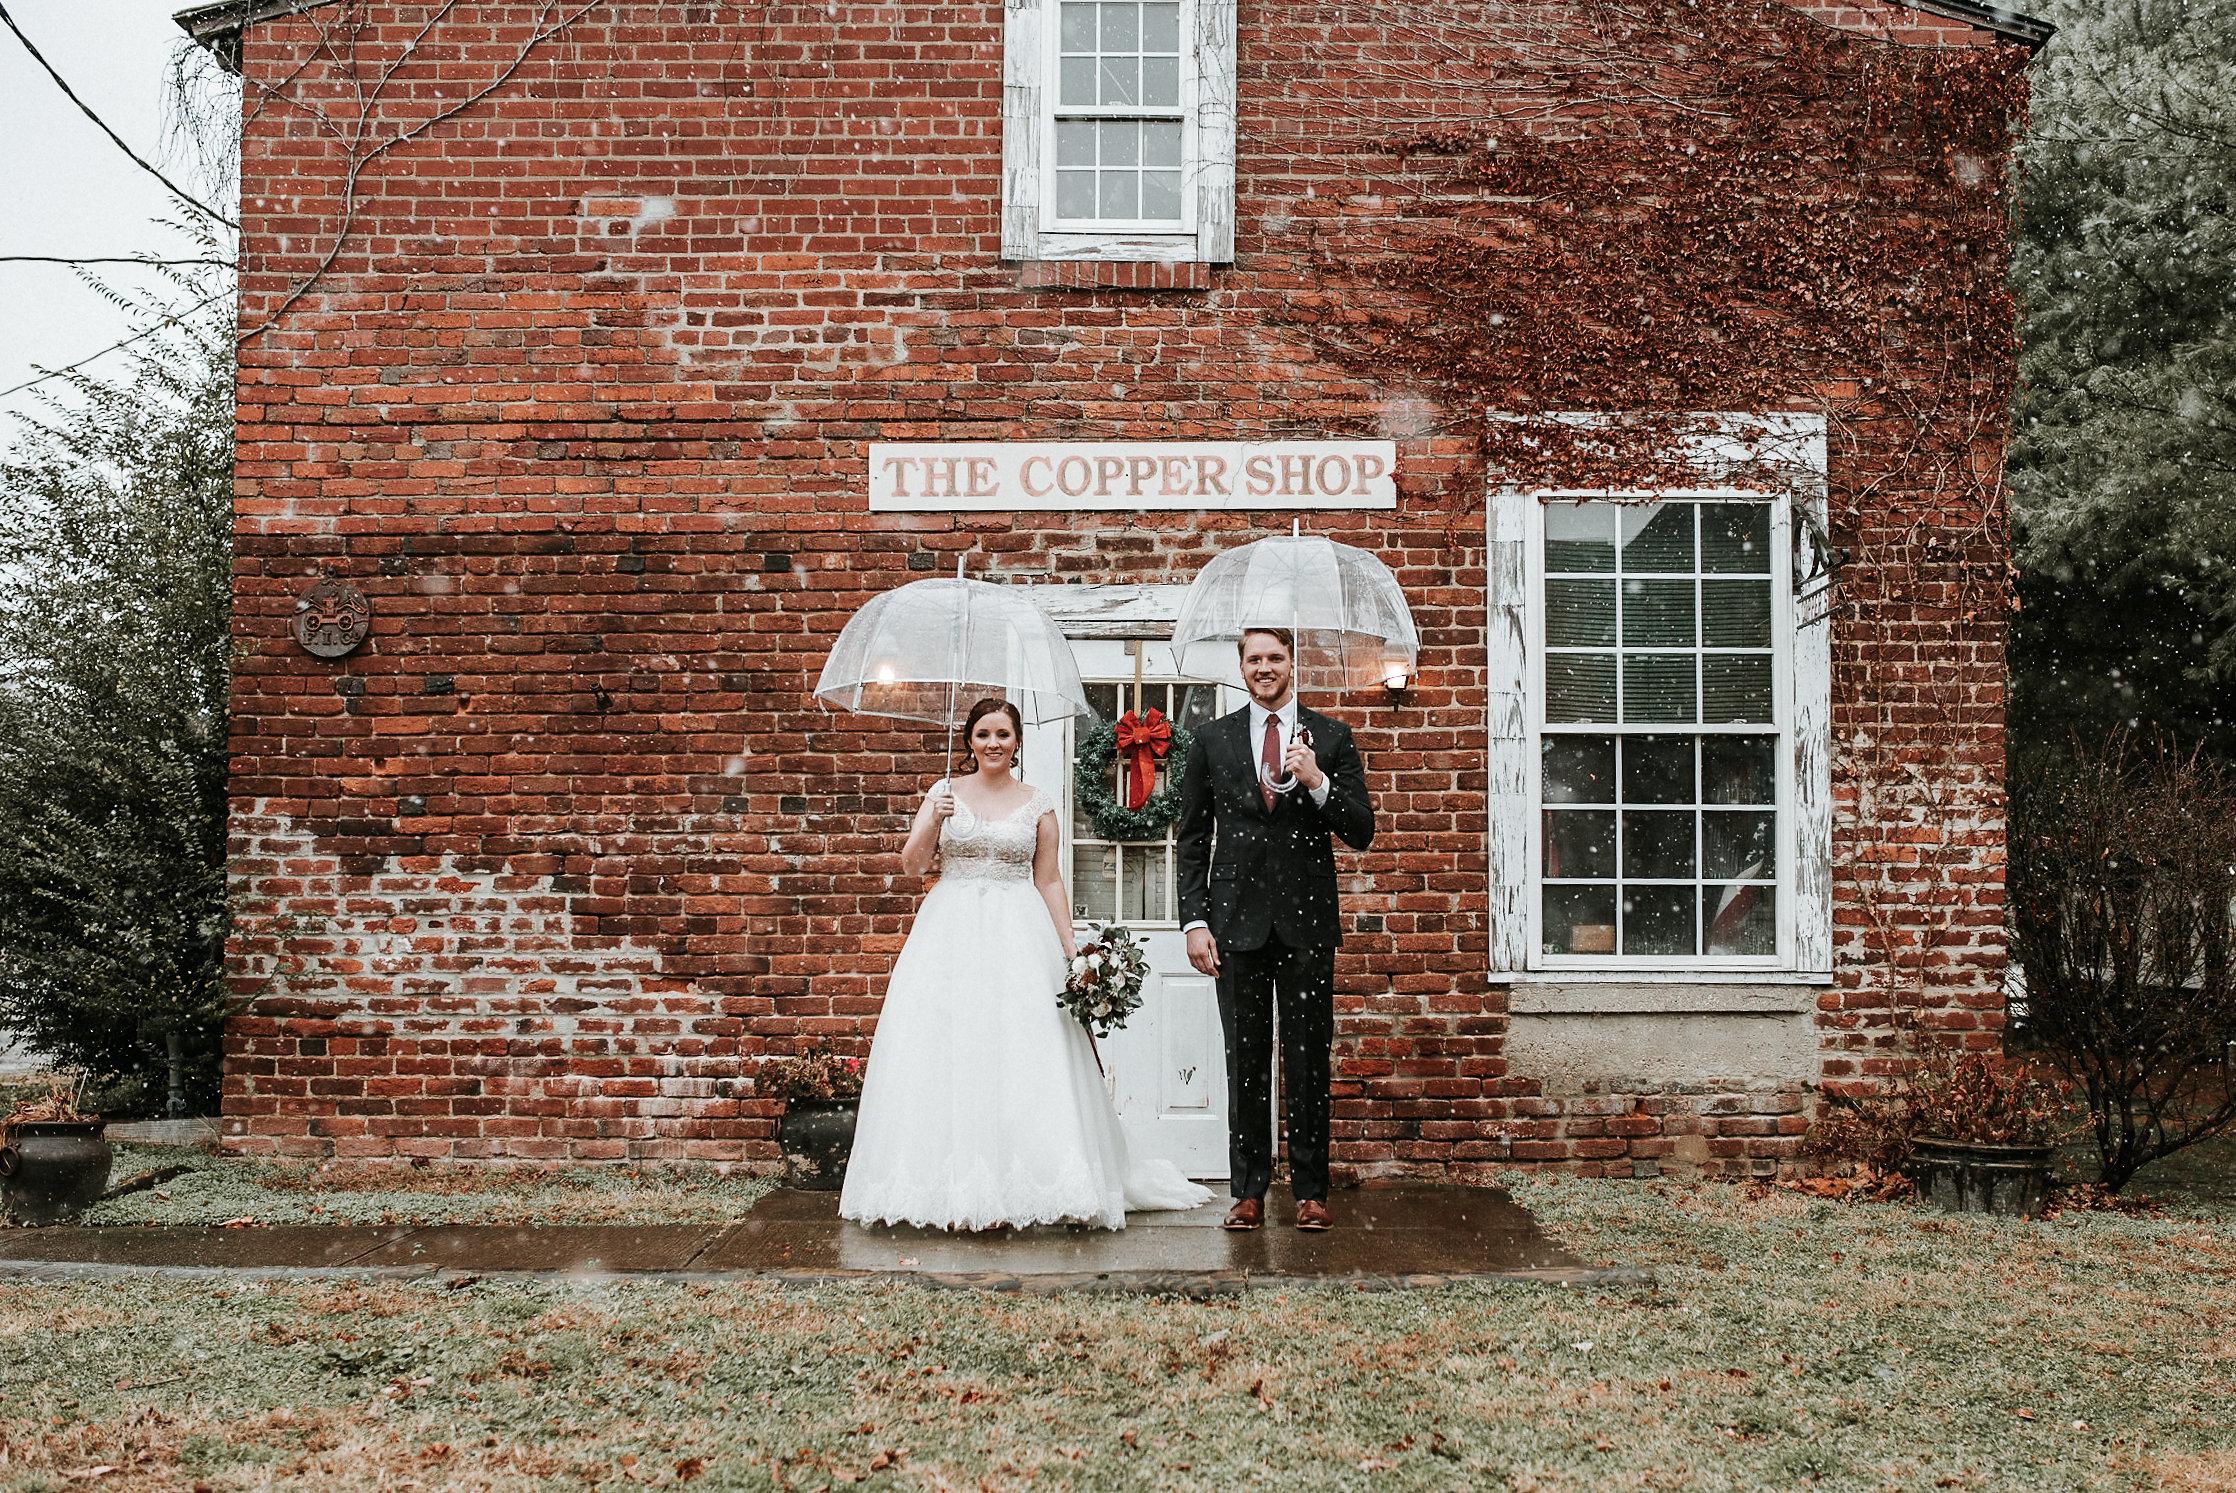 Bride and groom standing under umbrellas